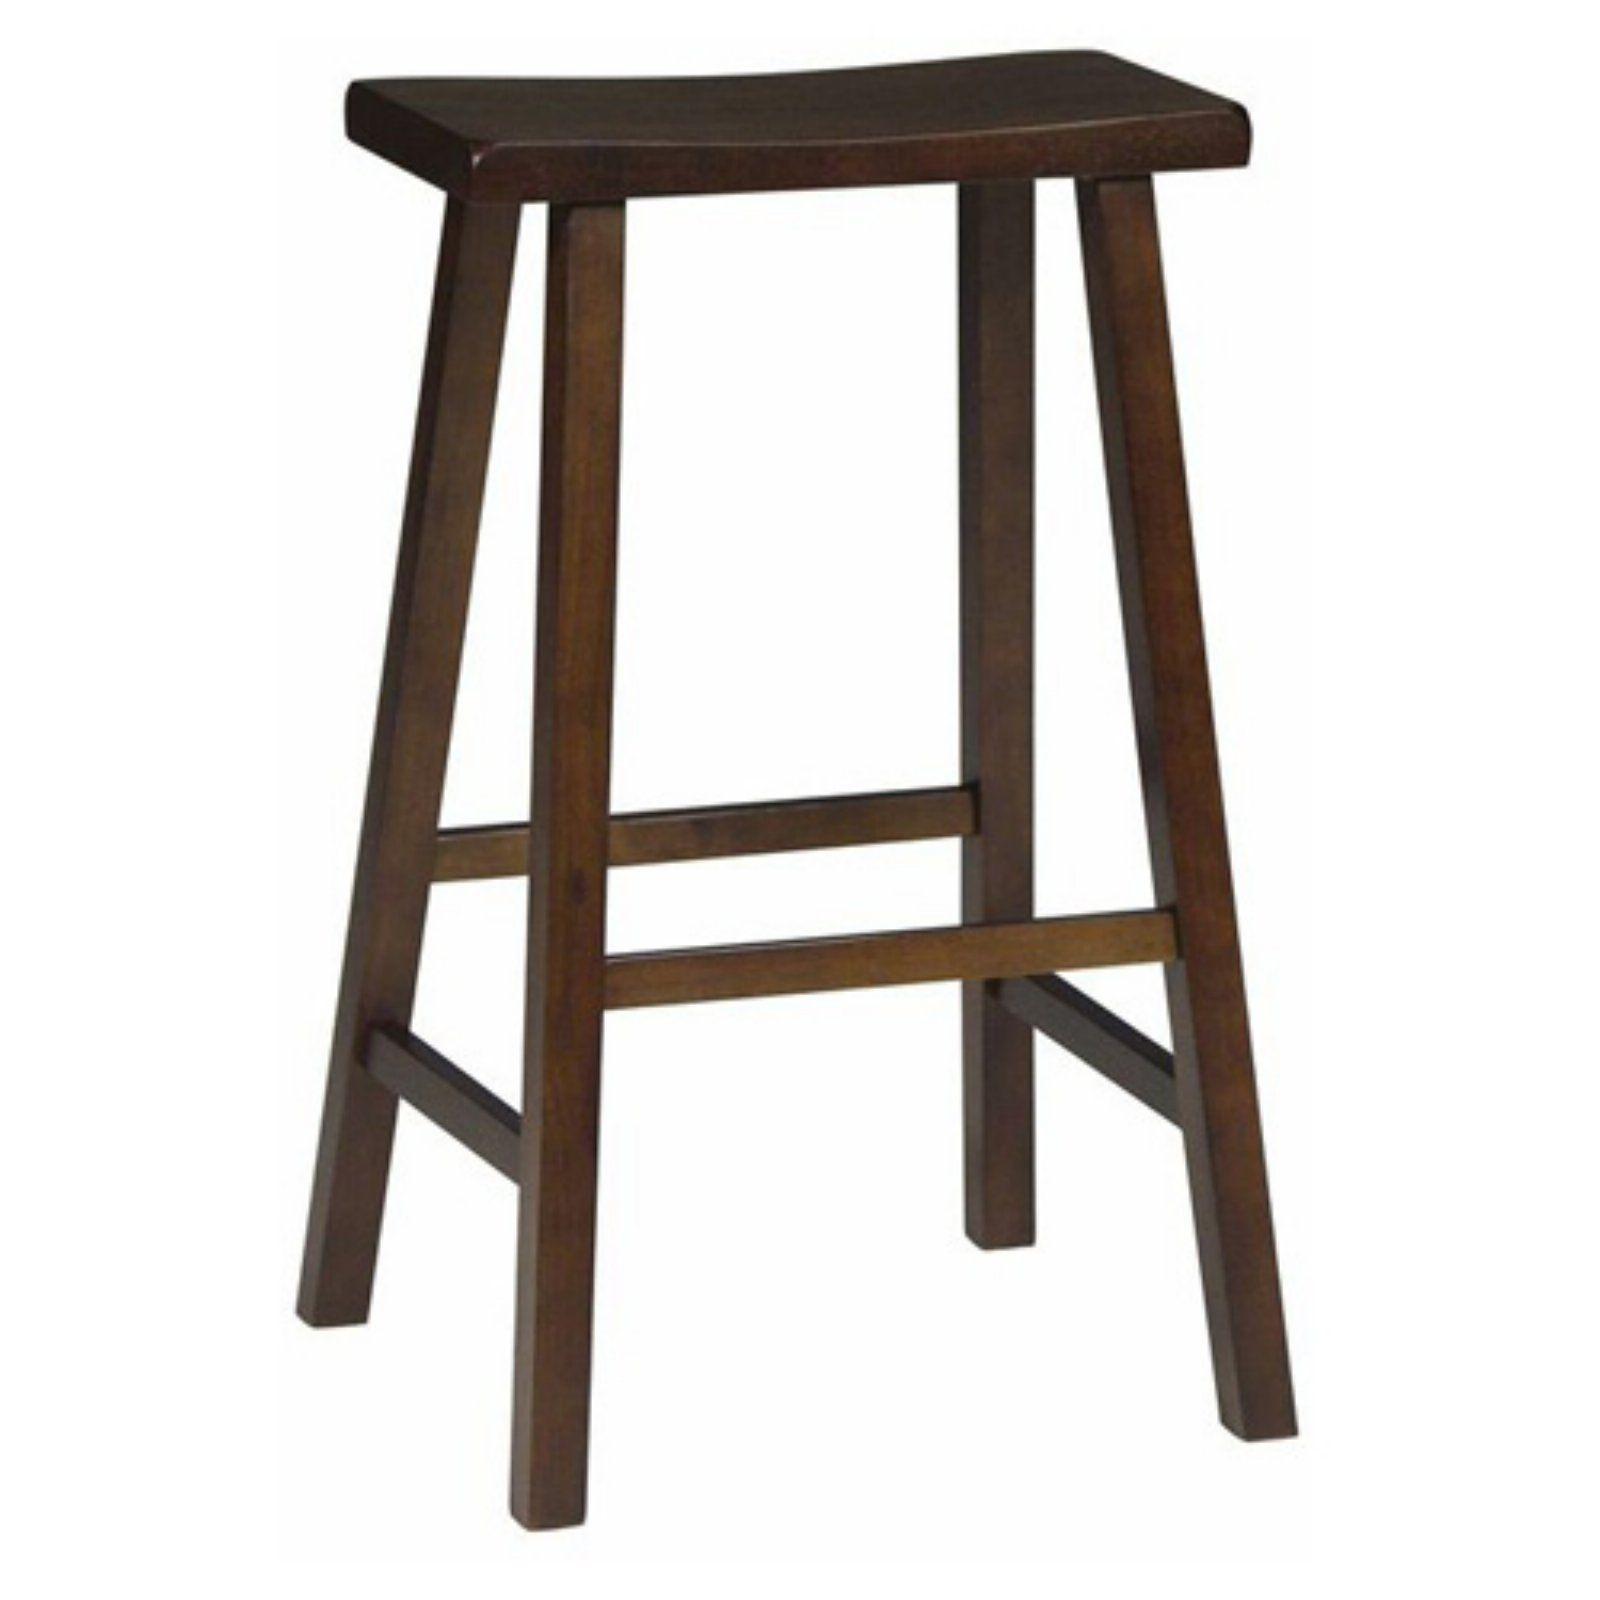 International Concepts Baileyton Backless Saddle Seat Bar Stool